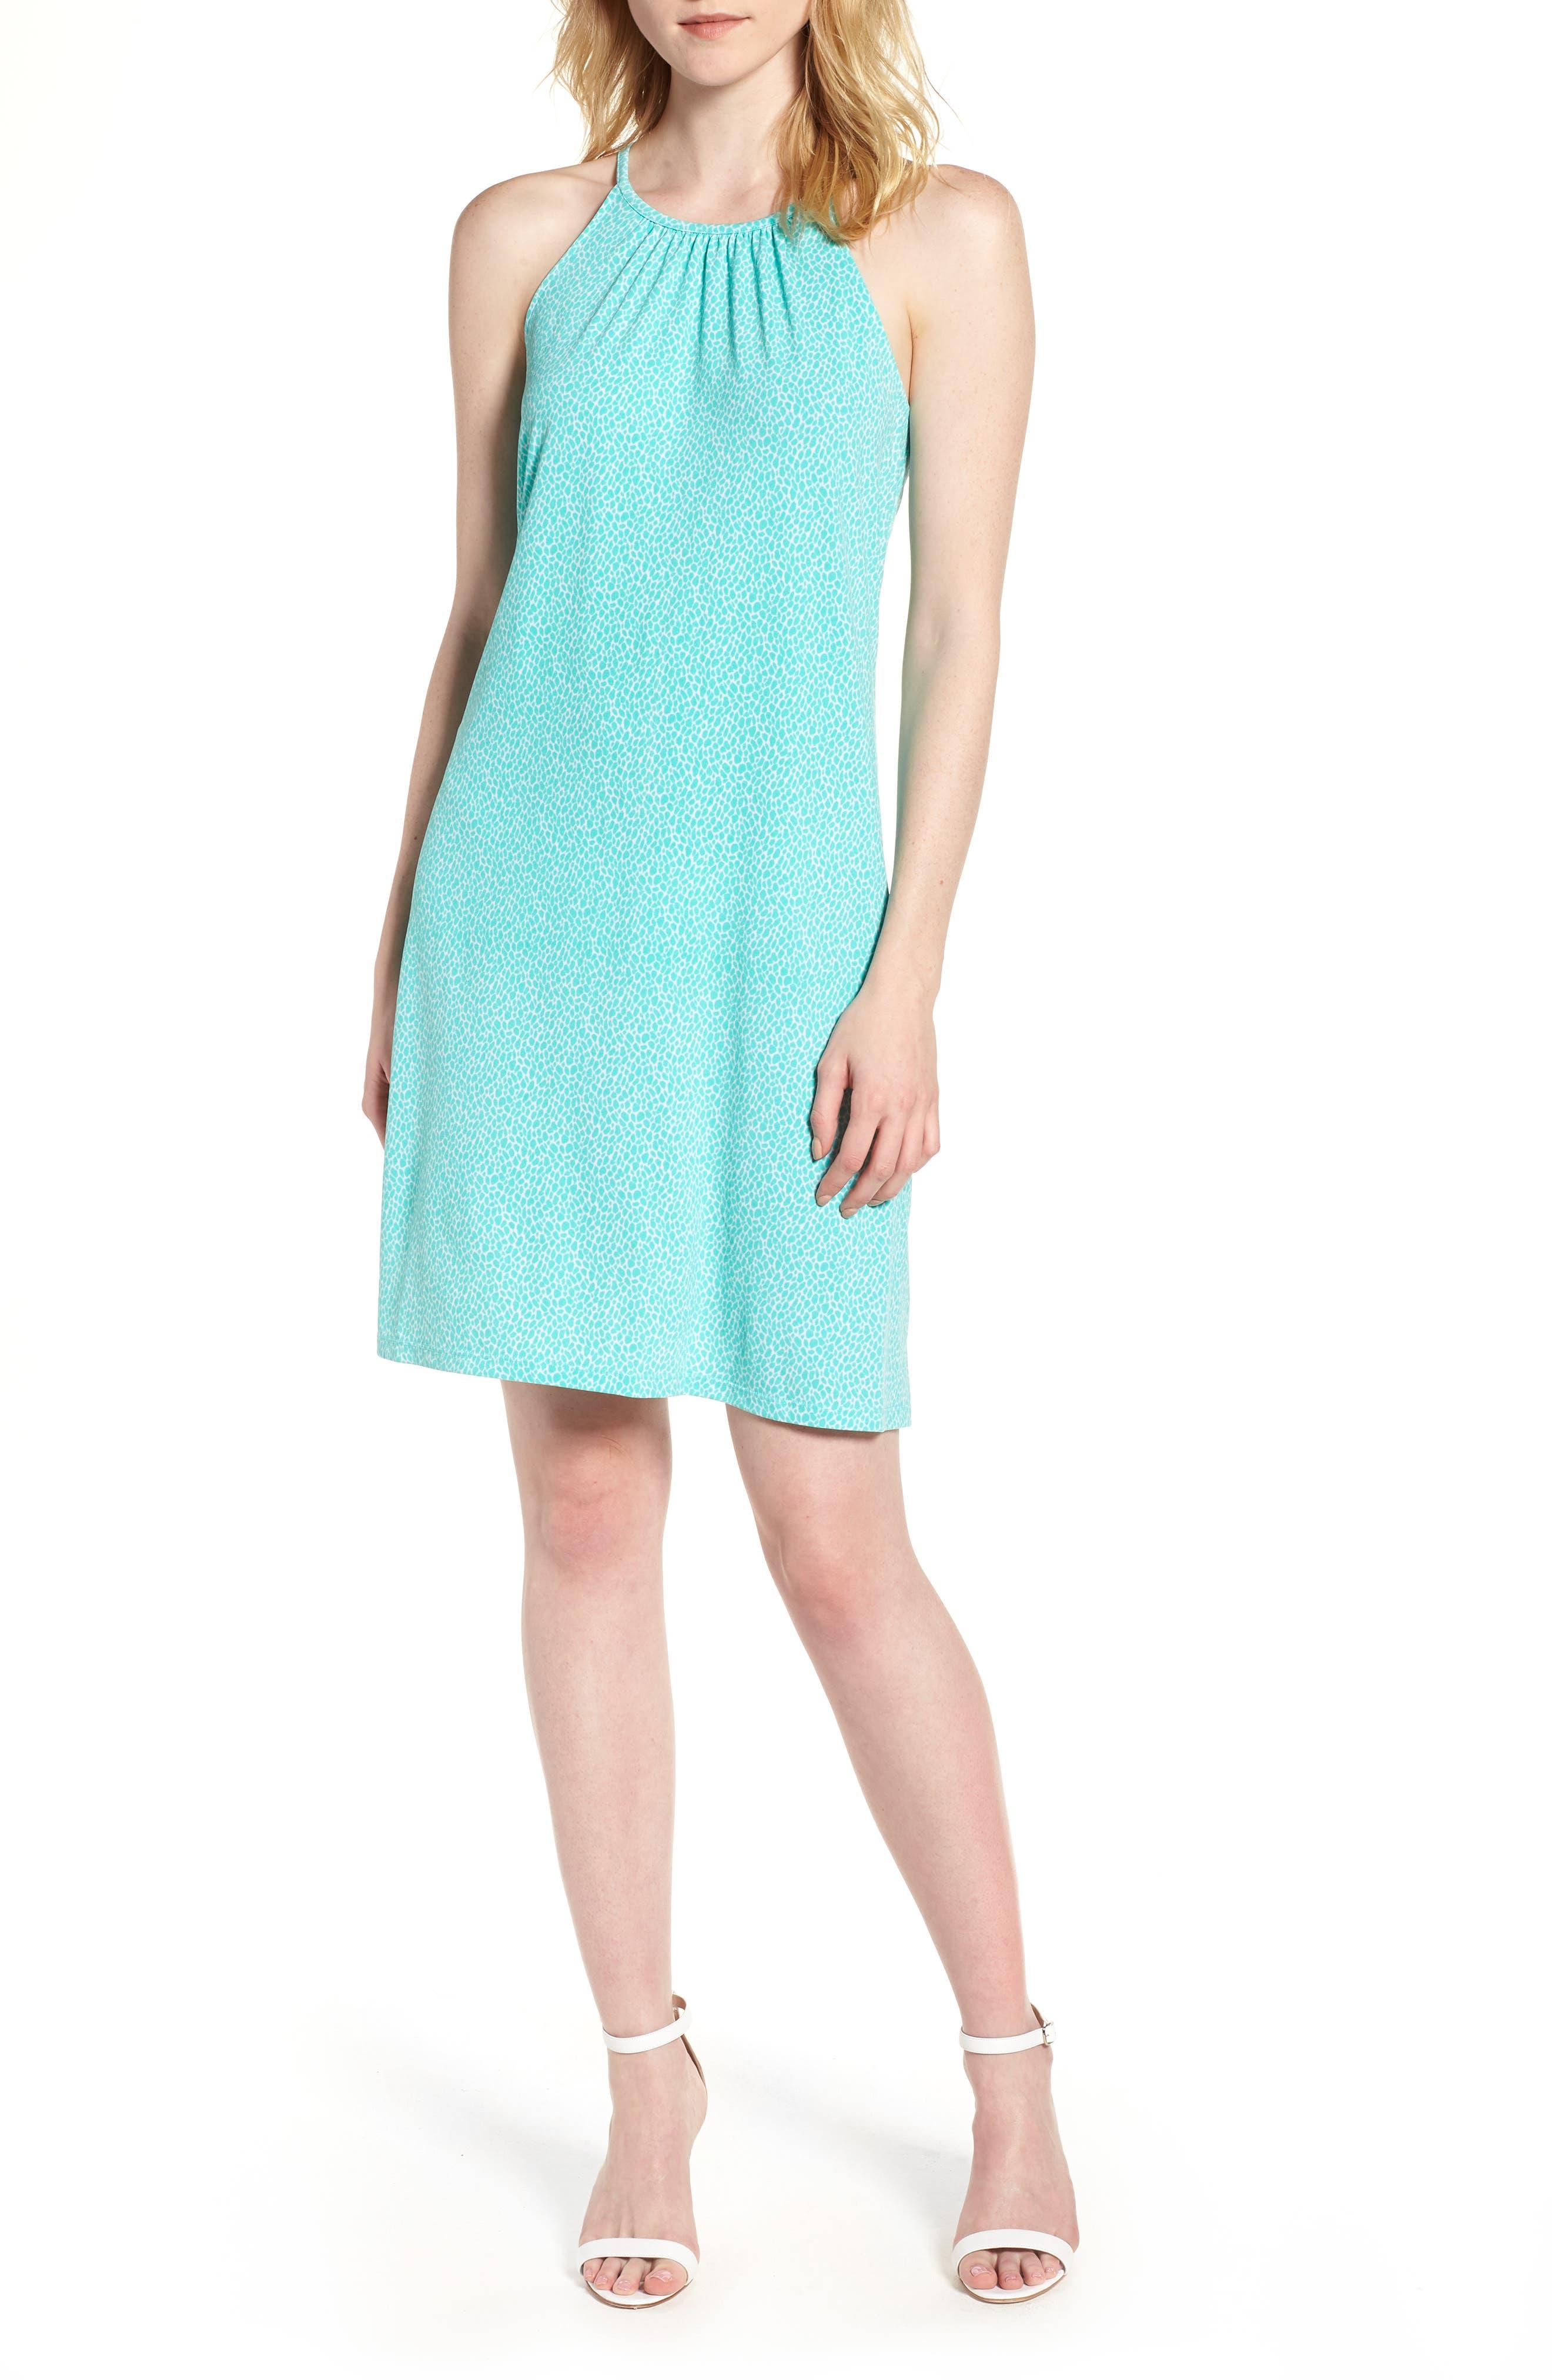 Leo Halter Top Mini Dress,                             Main thumbnail 1, color,                             199